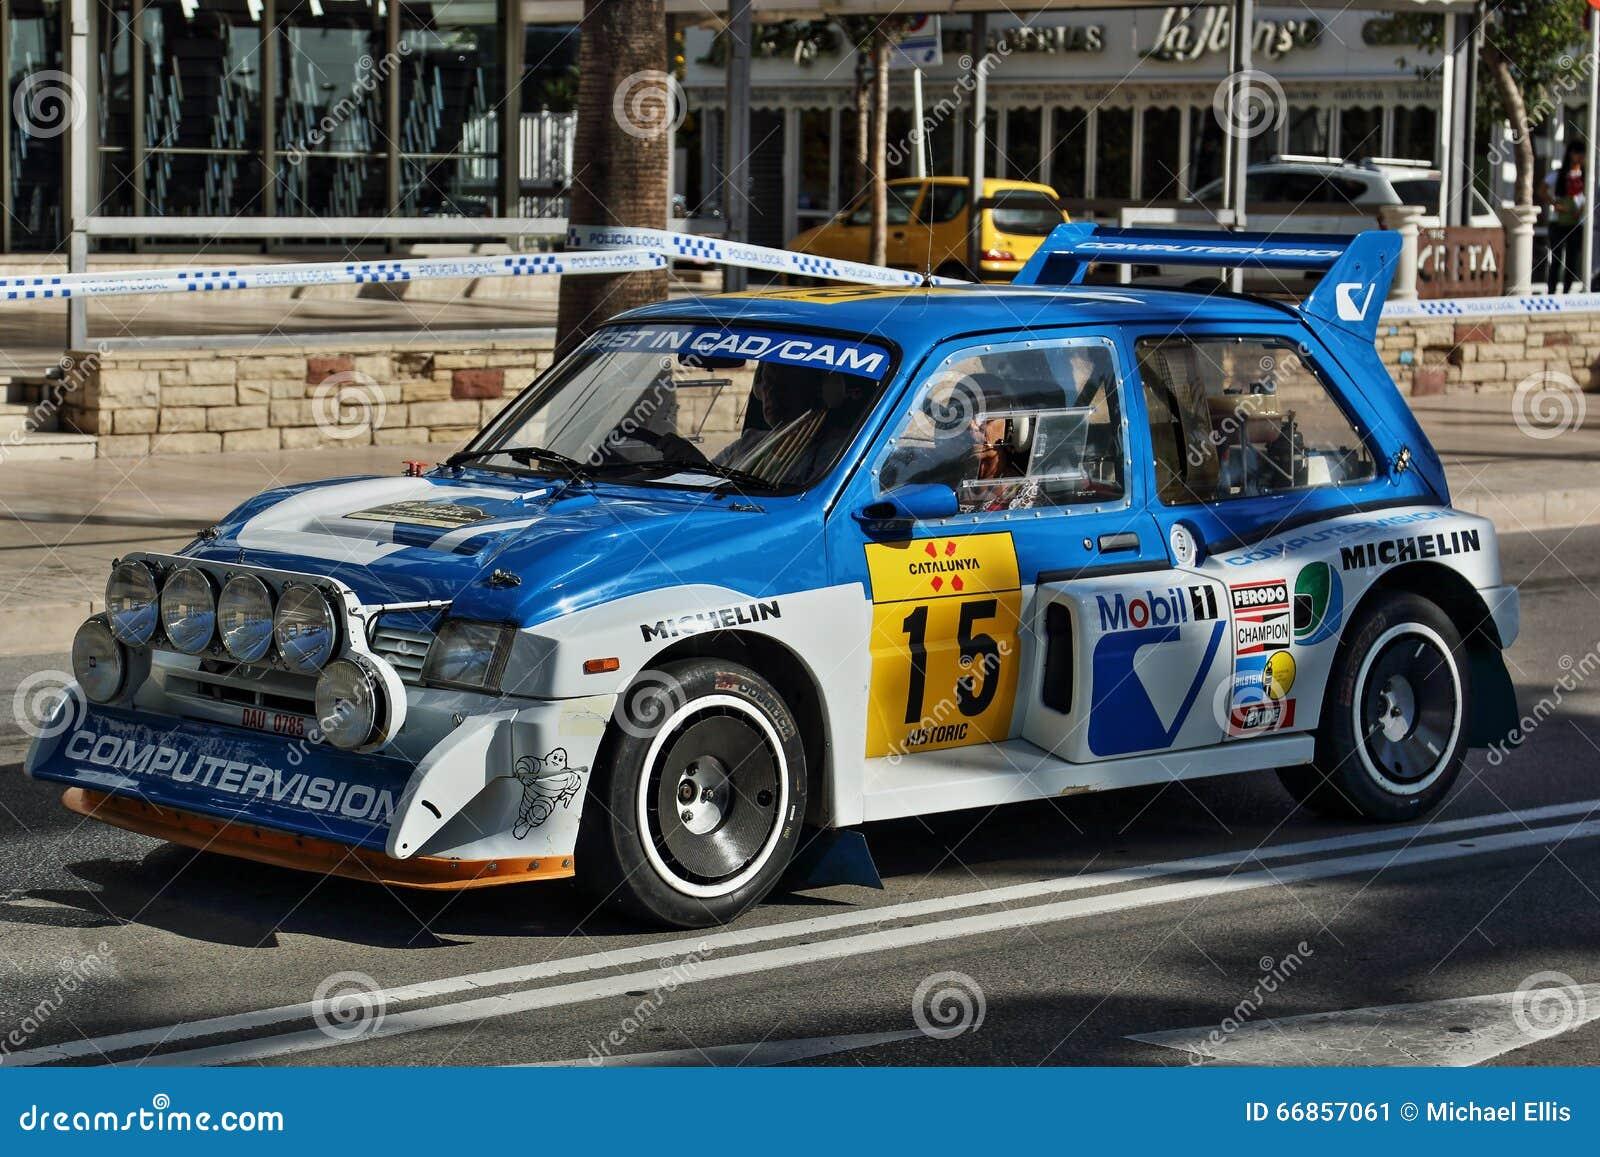 MG Metro 6R4 - WRC - 05 editorial photo. Image of championship ...